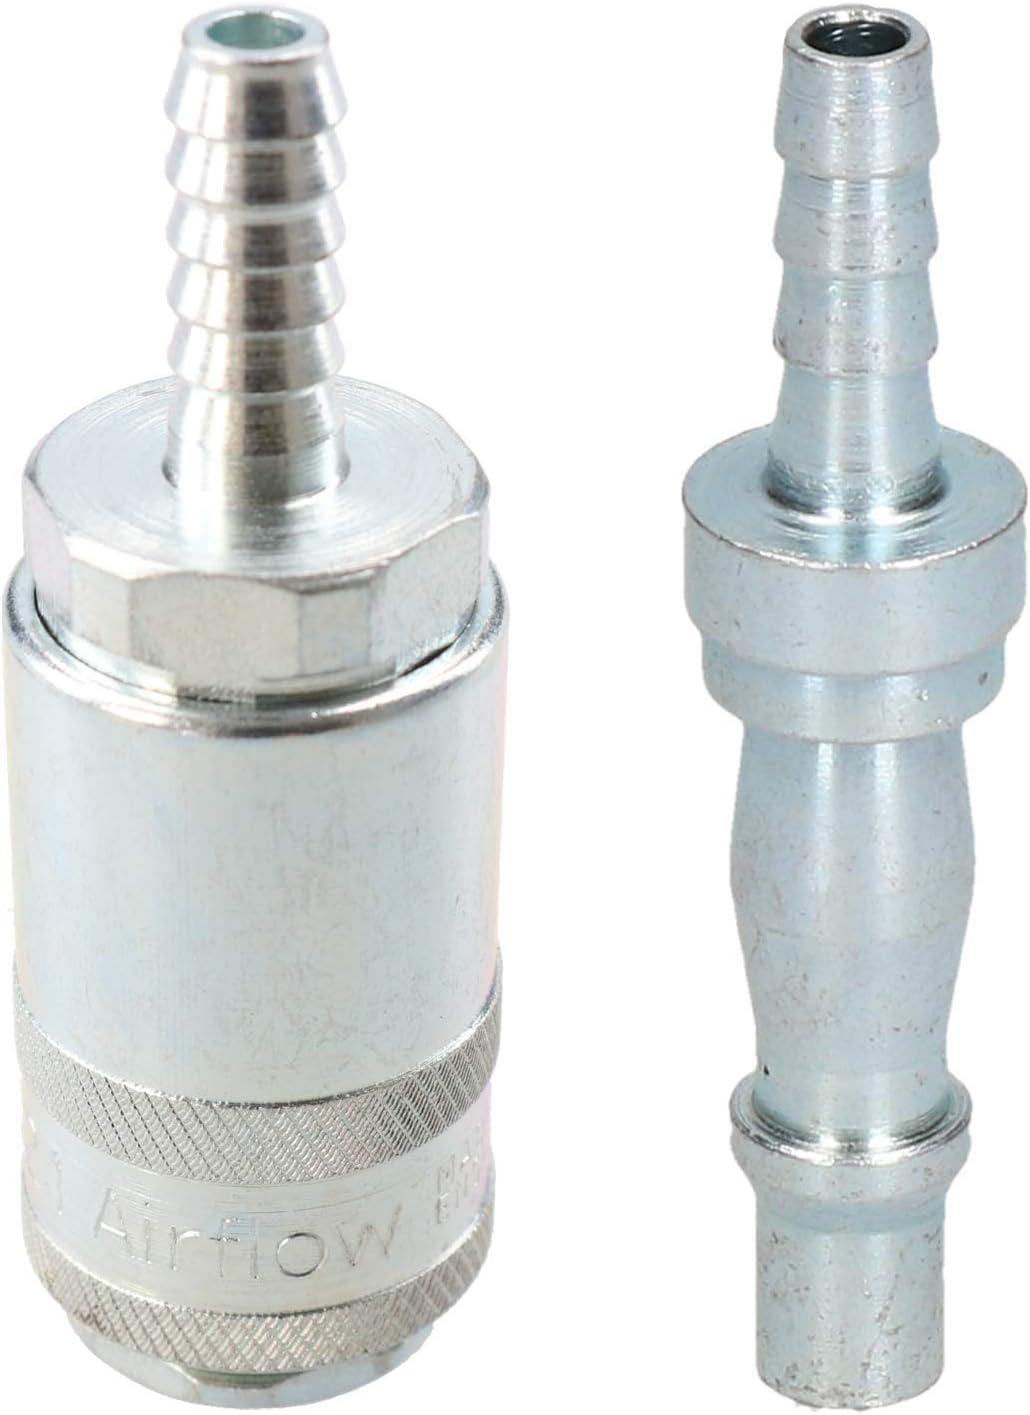 "Tuyau Queue Barb One Touch Coupleur AC21R 1//4/"" PCL Airflow couplage 6.35 mm"